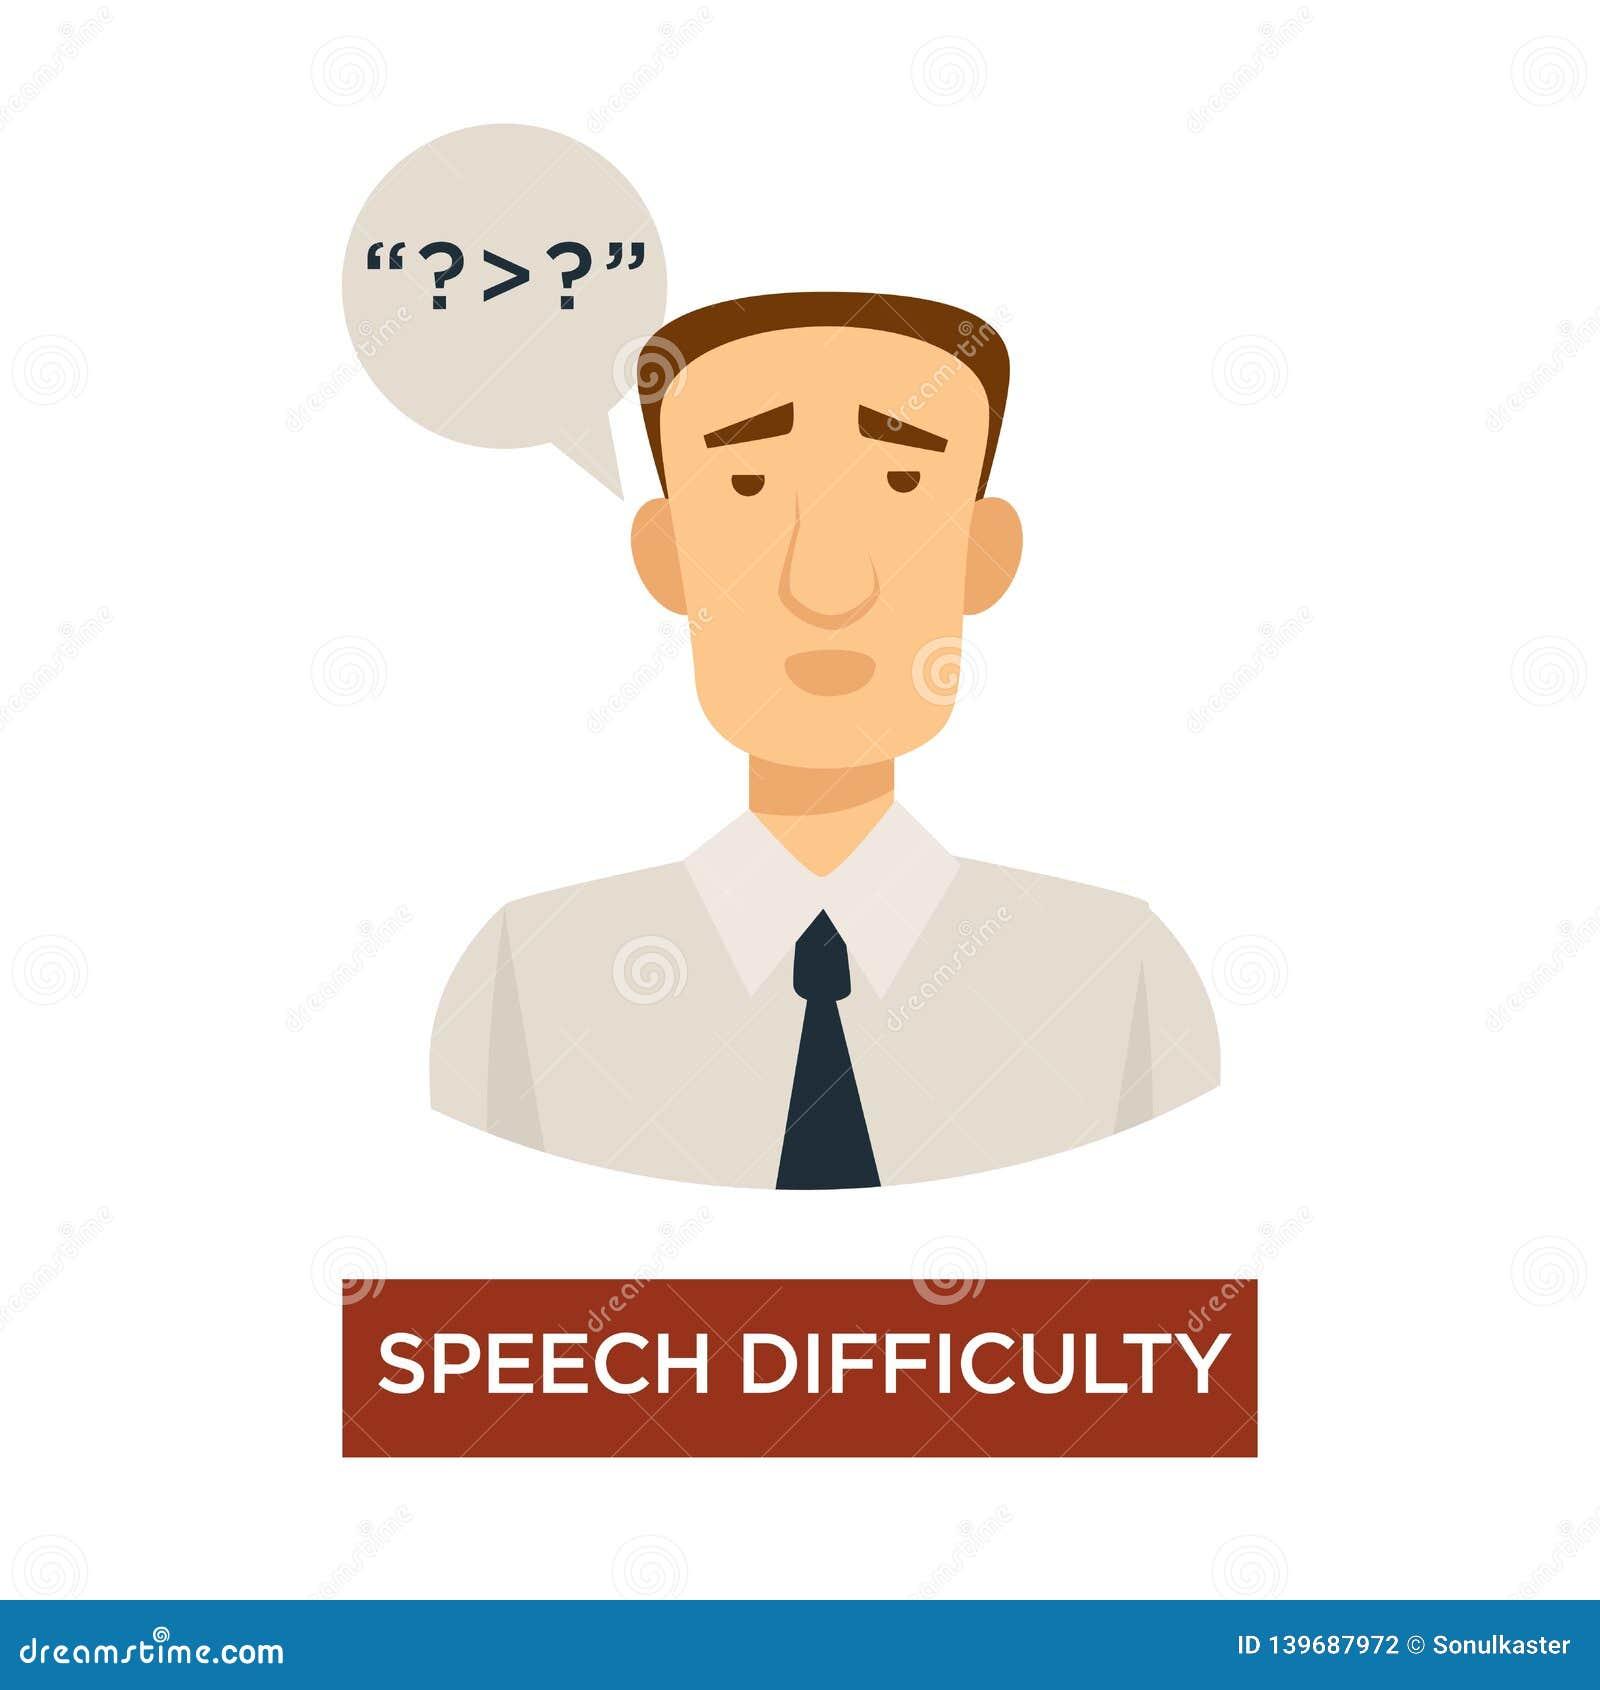 Speech difficulty symptom stroke sign disease prevention